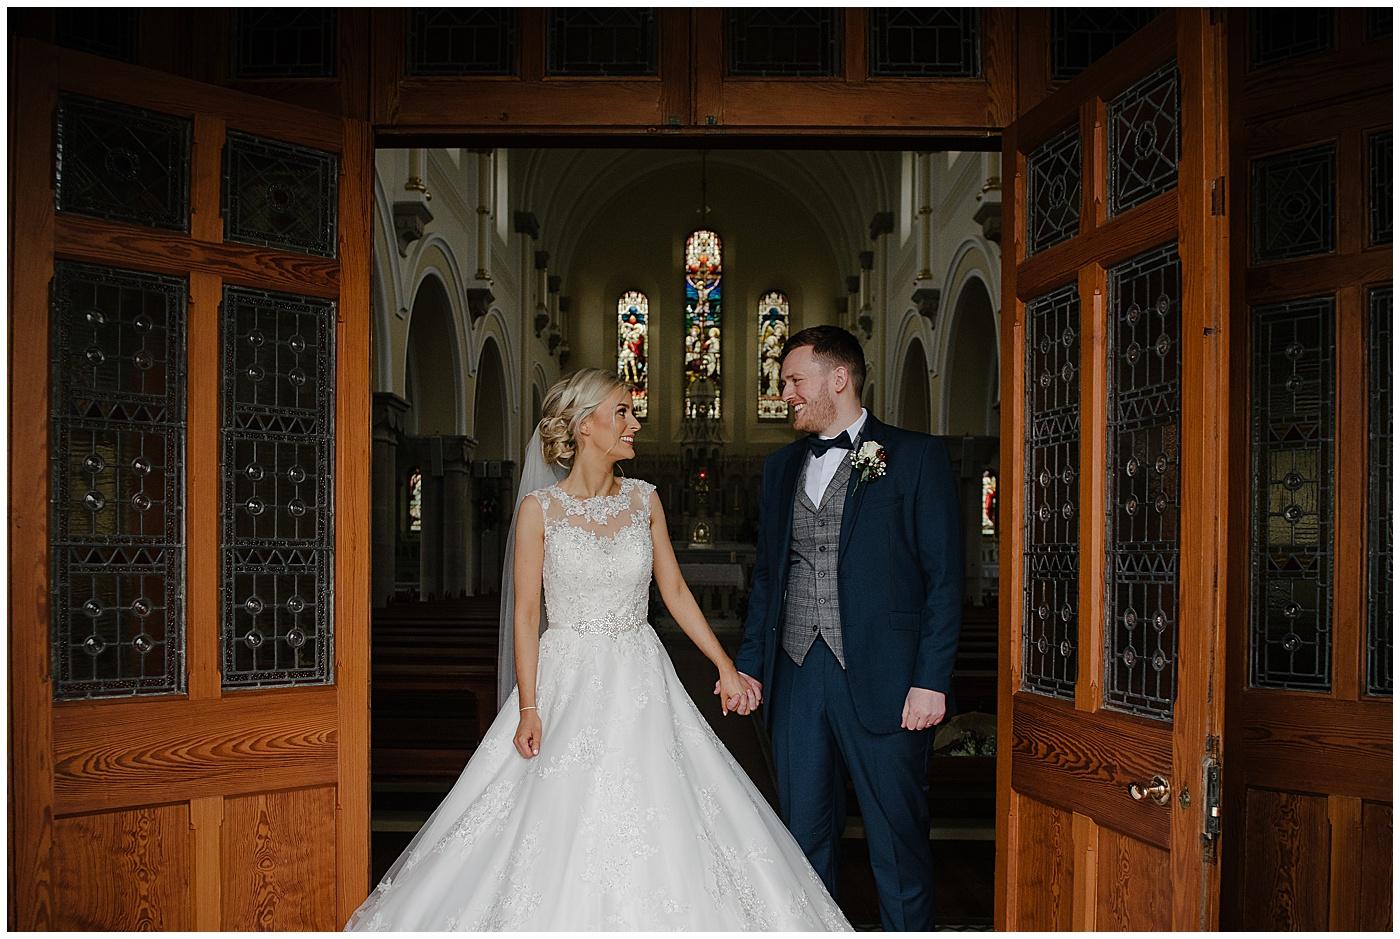 lissan-house-wedding-jude-browne-photography_0055.jpg